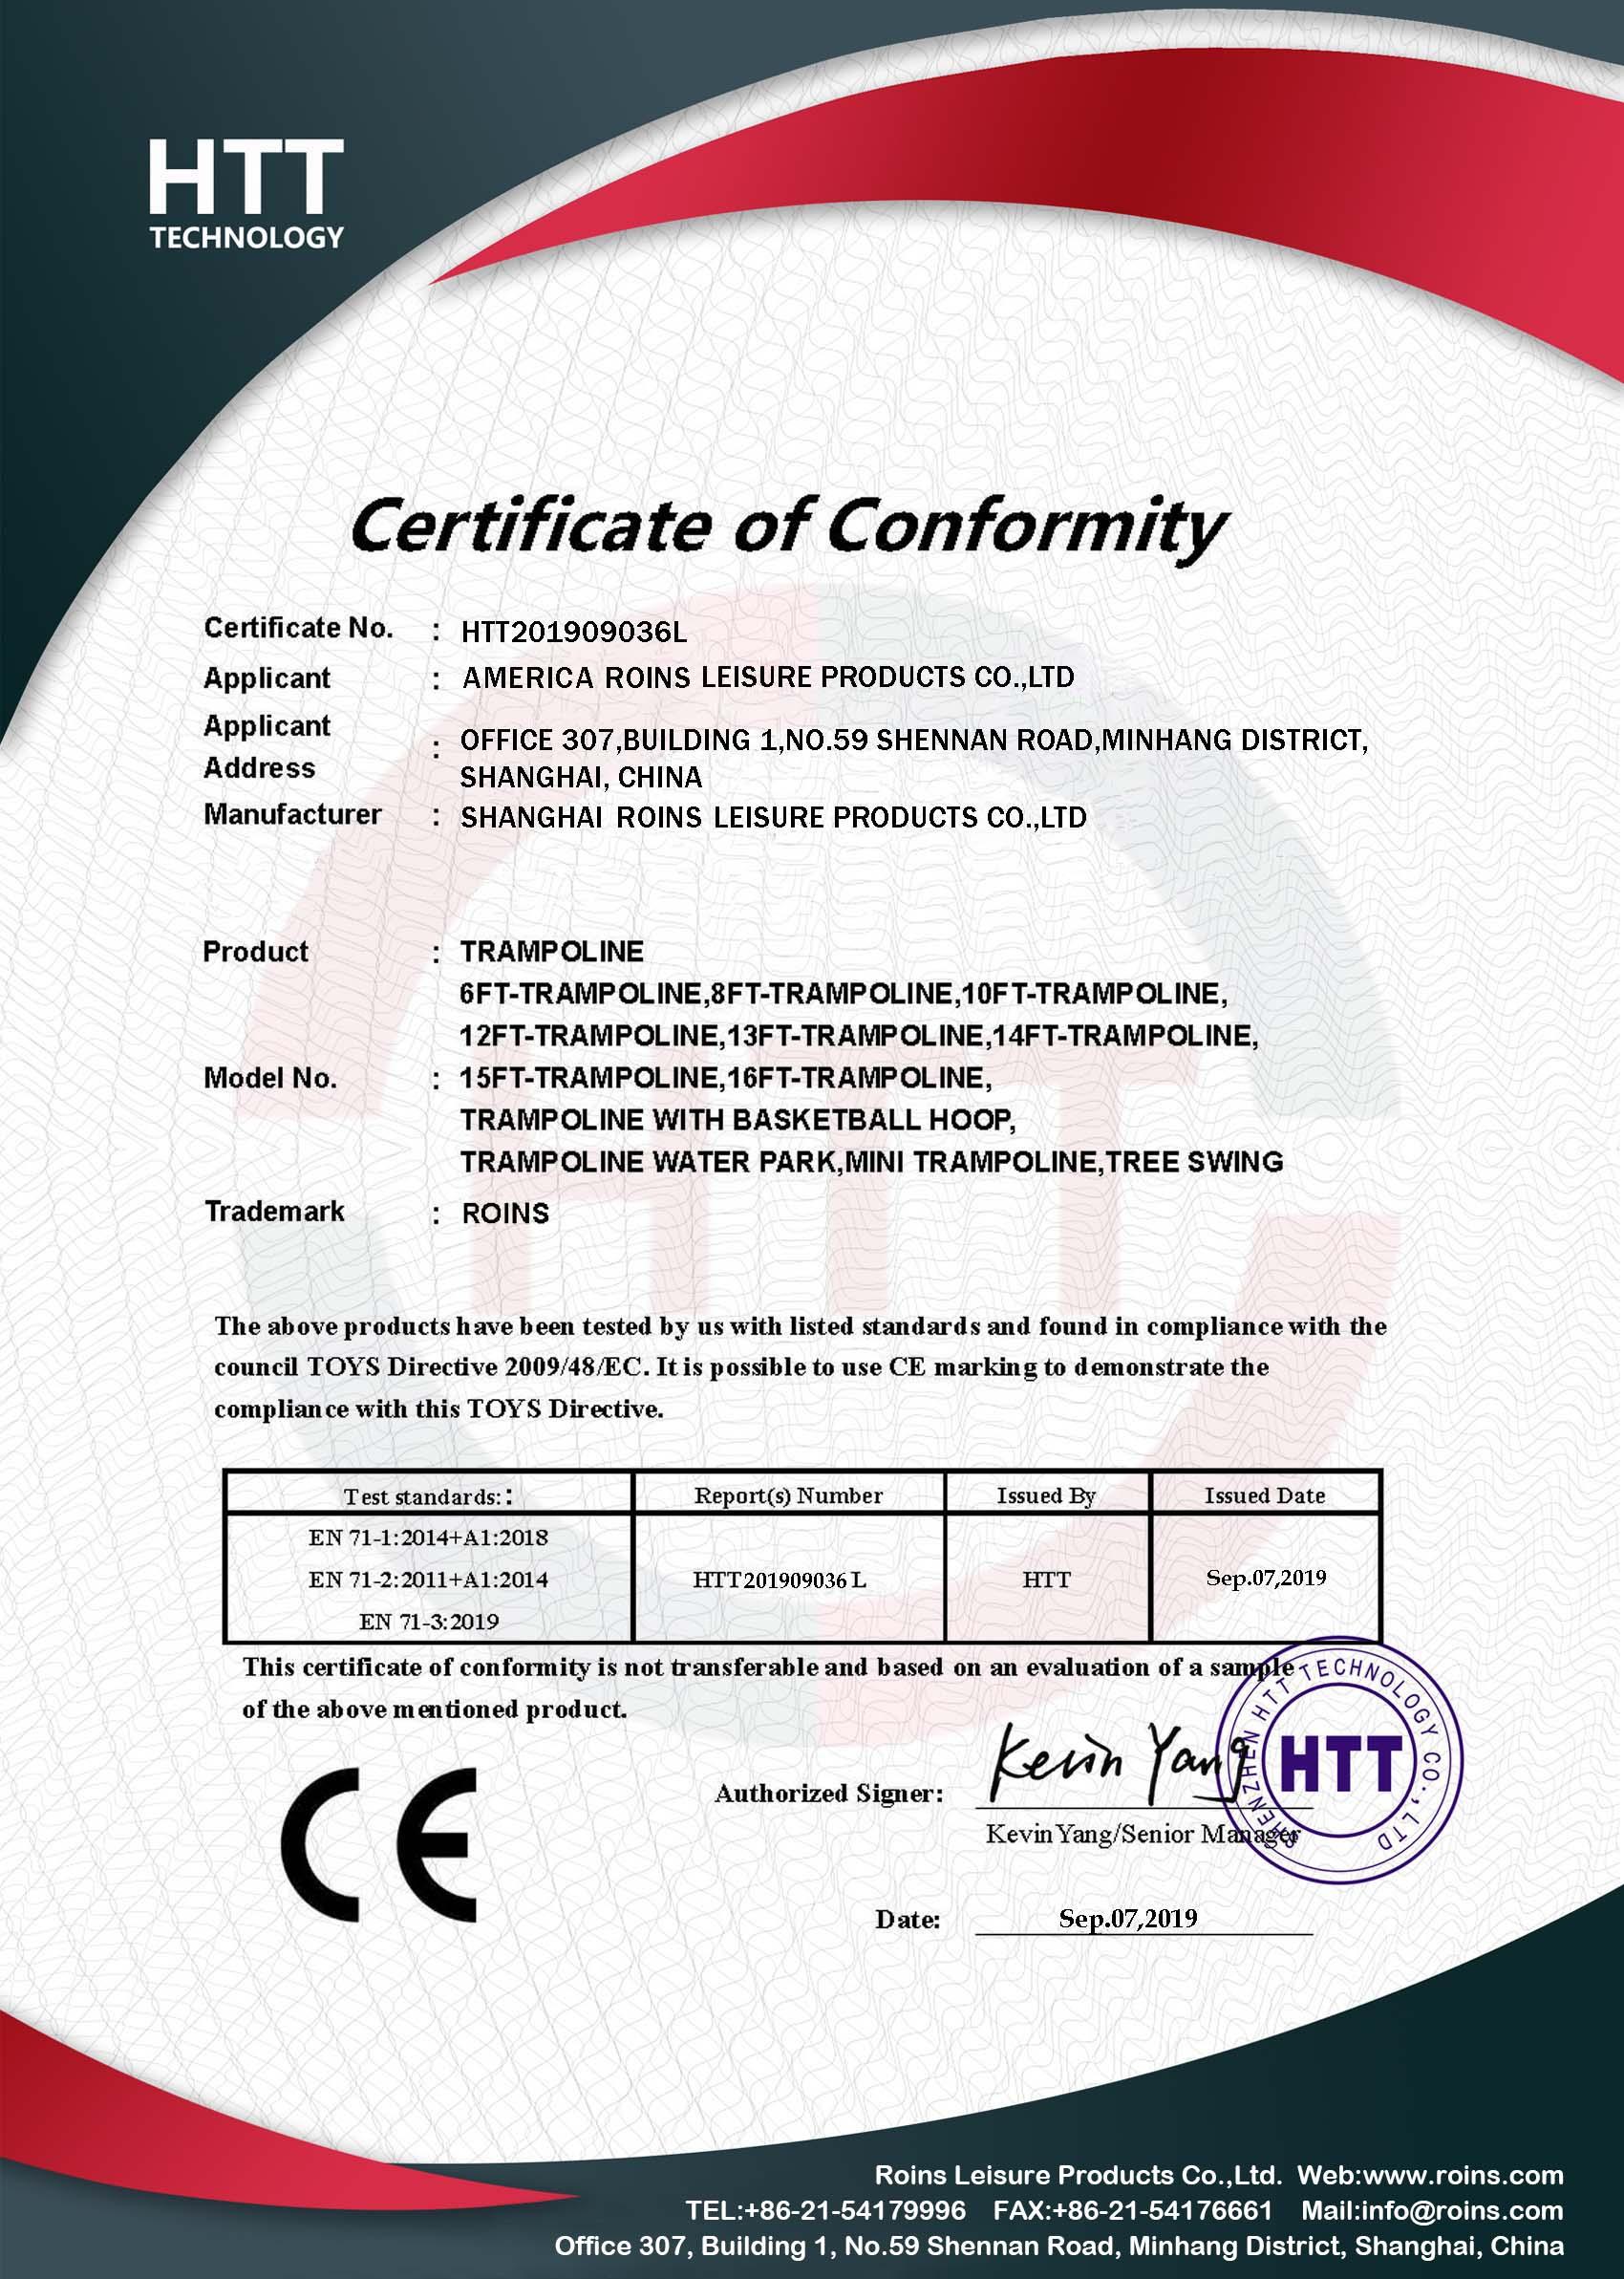 CE(1)6.18(3)